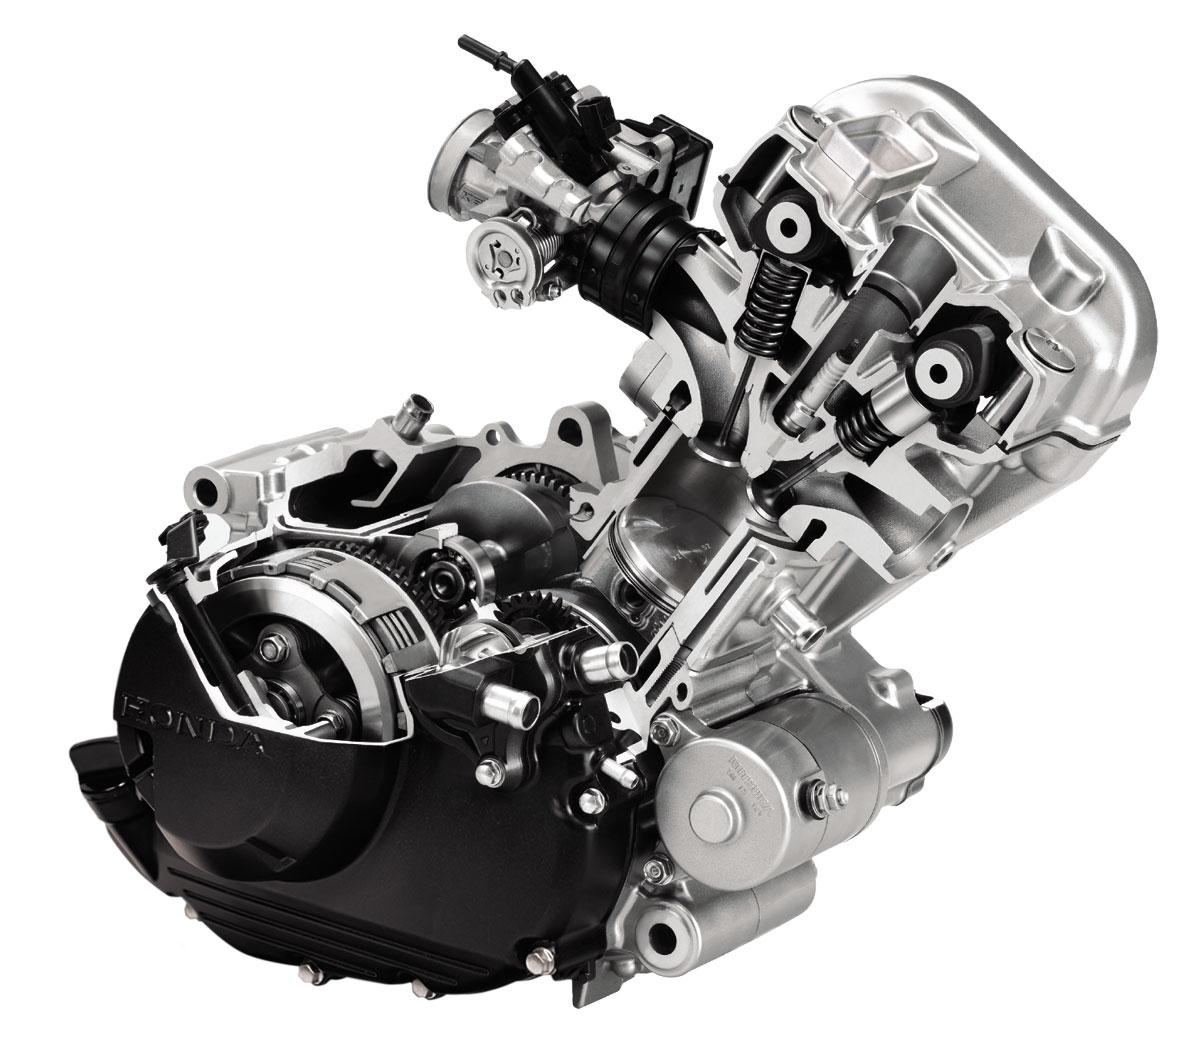 Inilah Keunggulan Mesin Honda All New CBR 150R